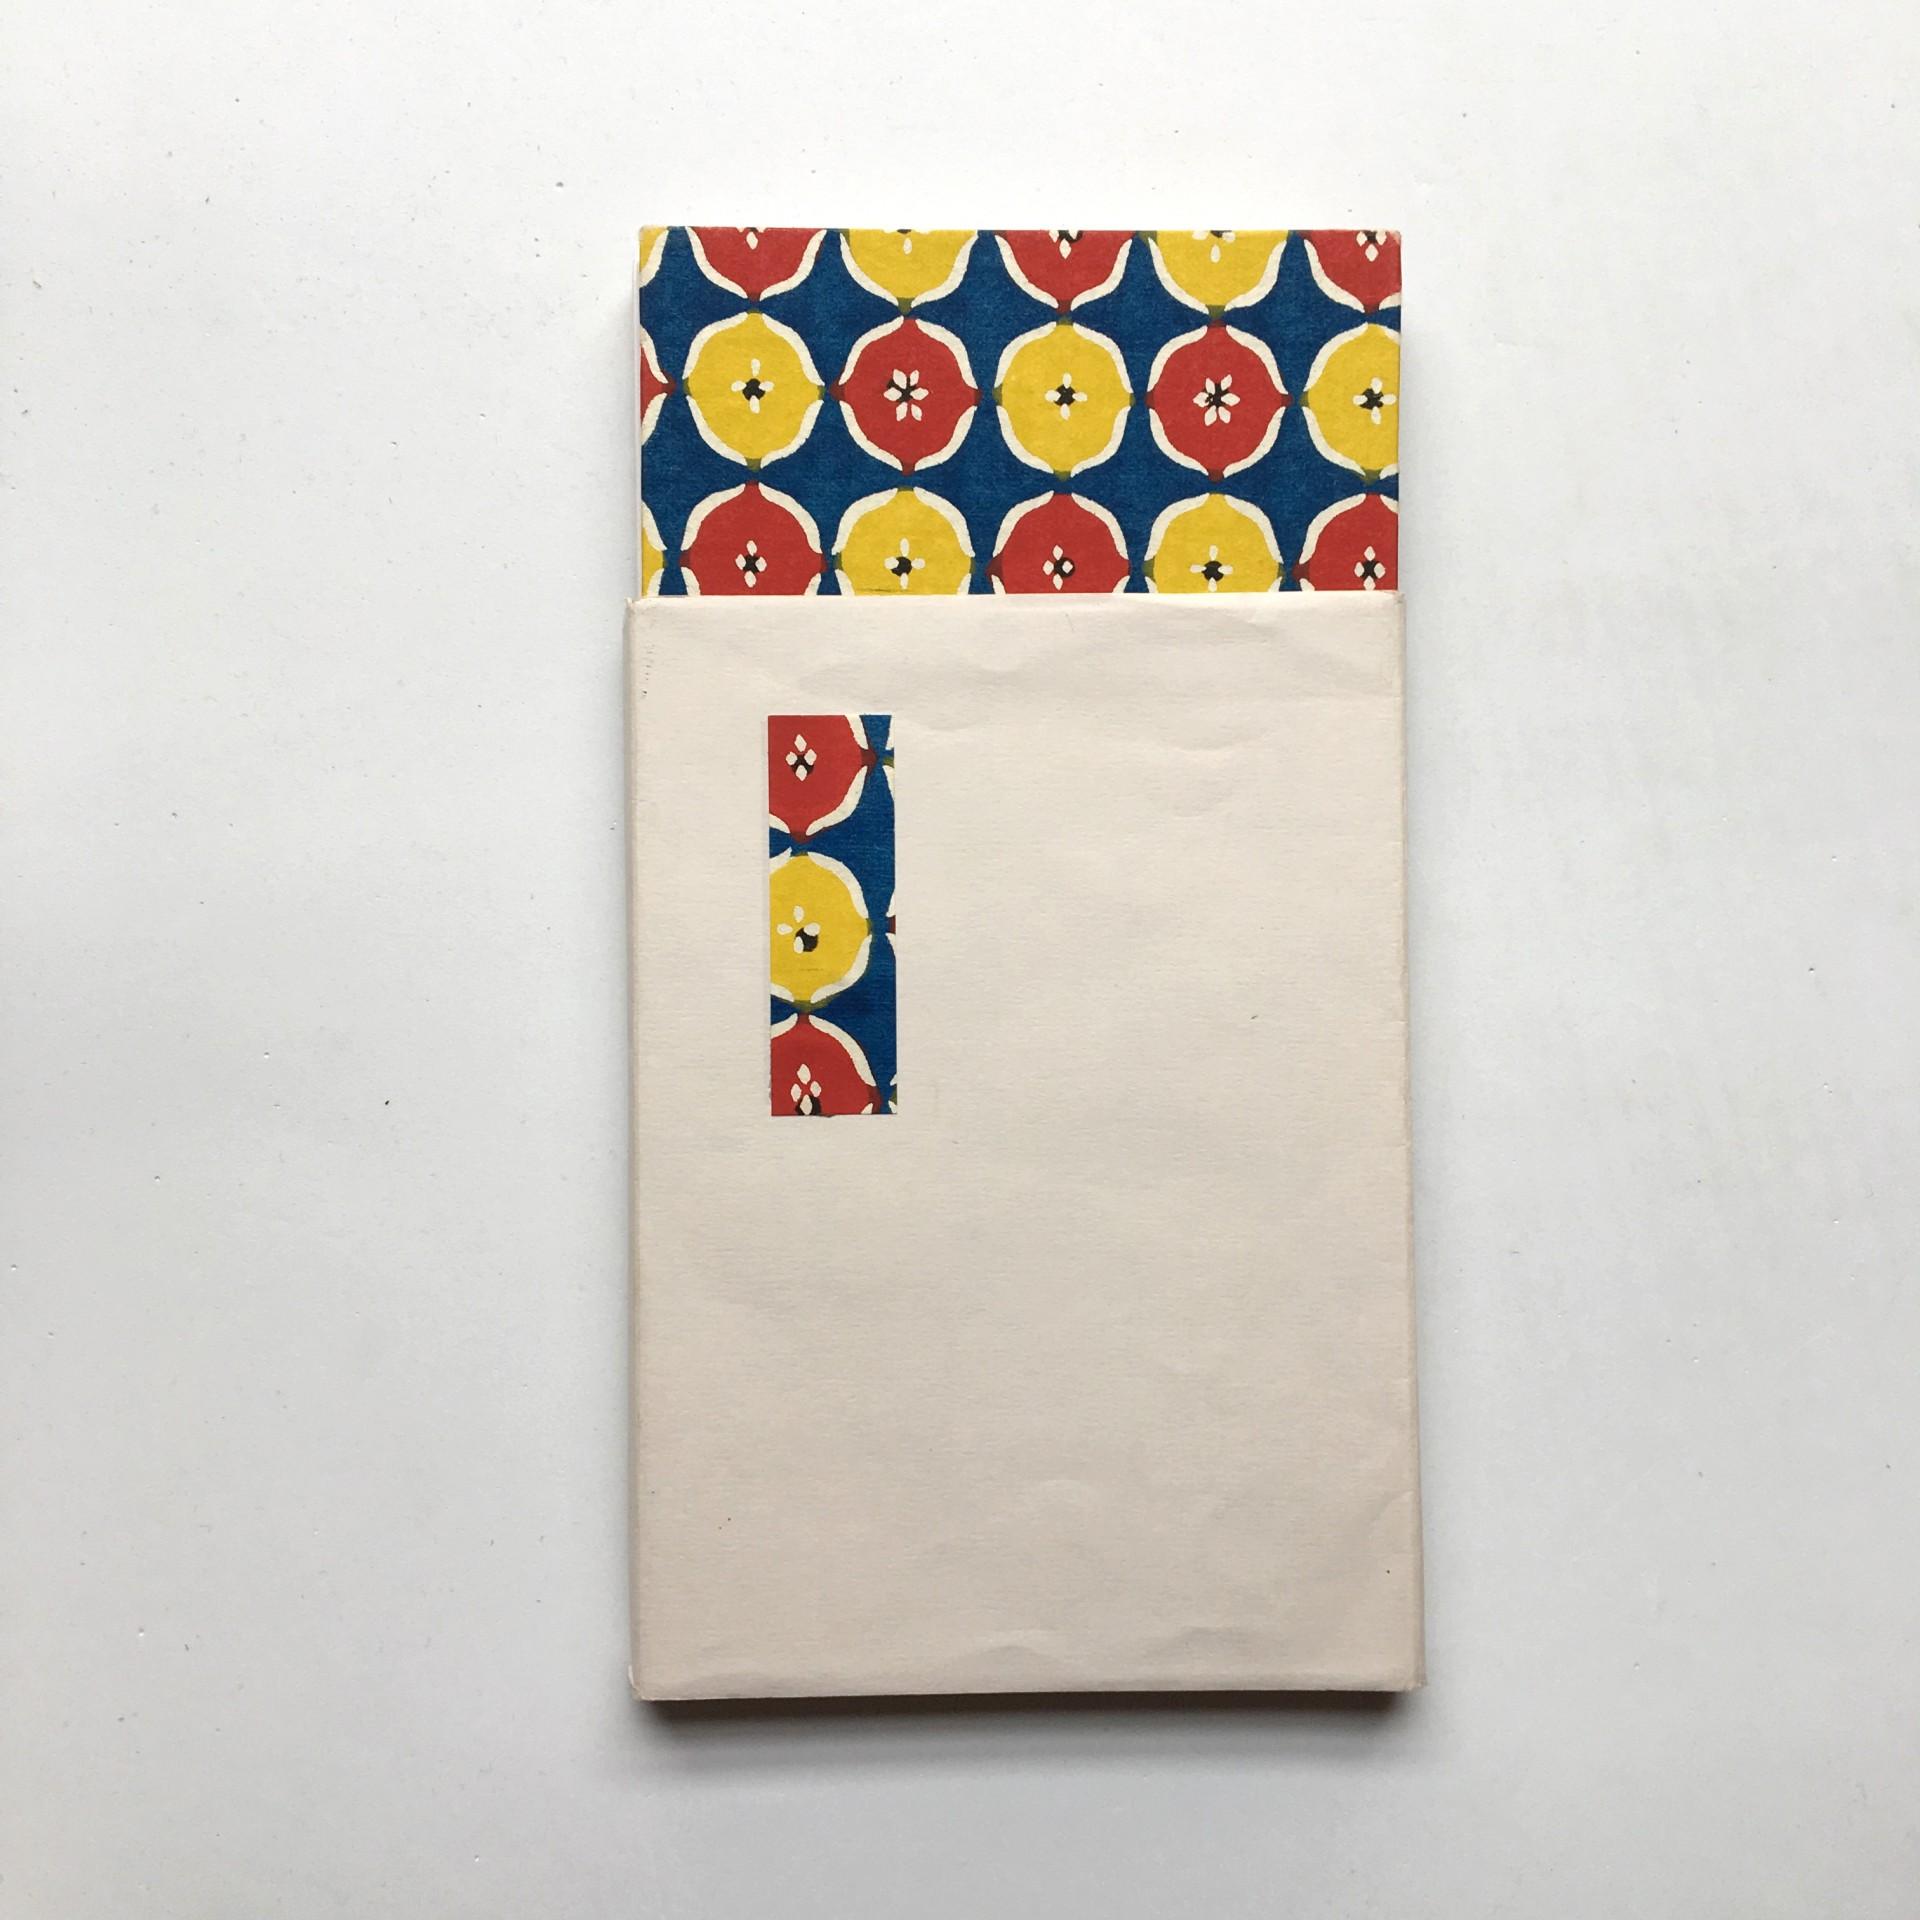 Ama-San: Livro Fotográfico